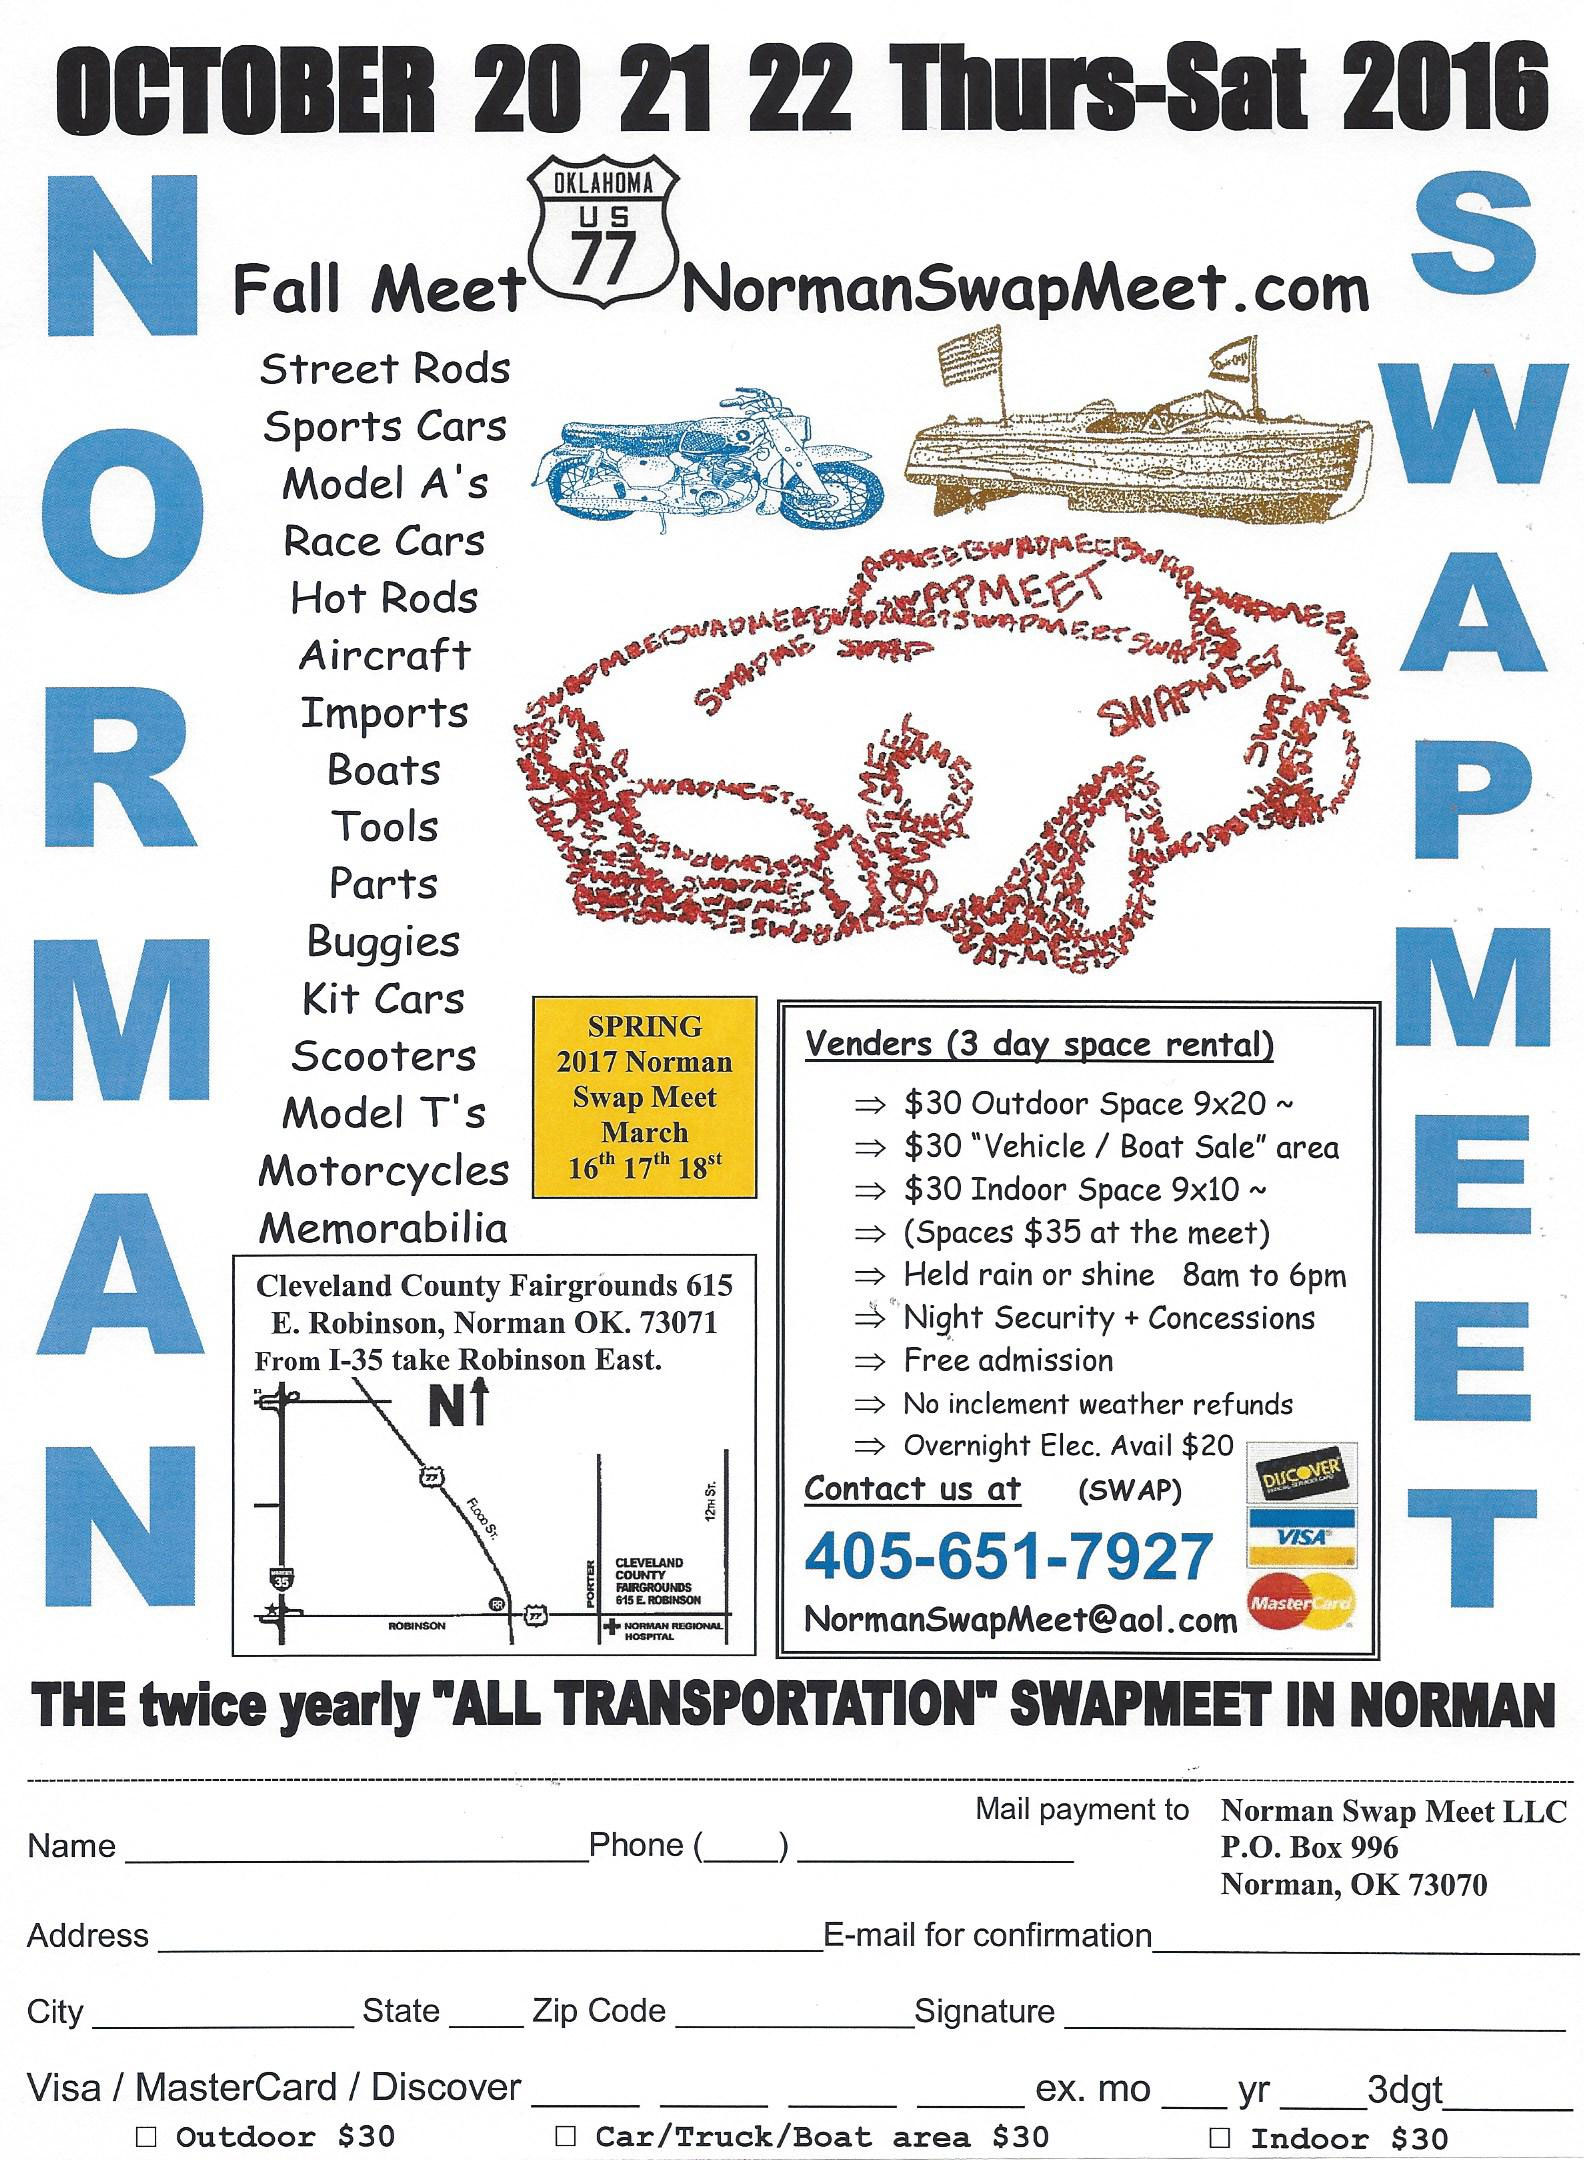 2017 Norman Motorcycle Swap Meet - Spring Norman,OK